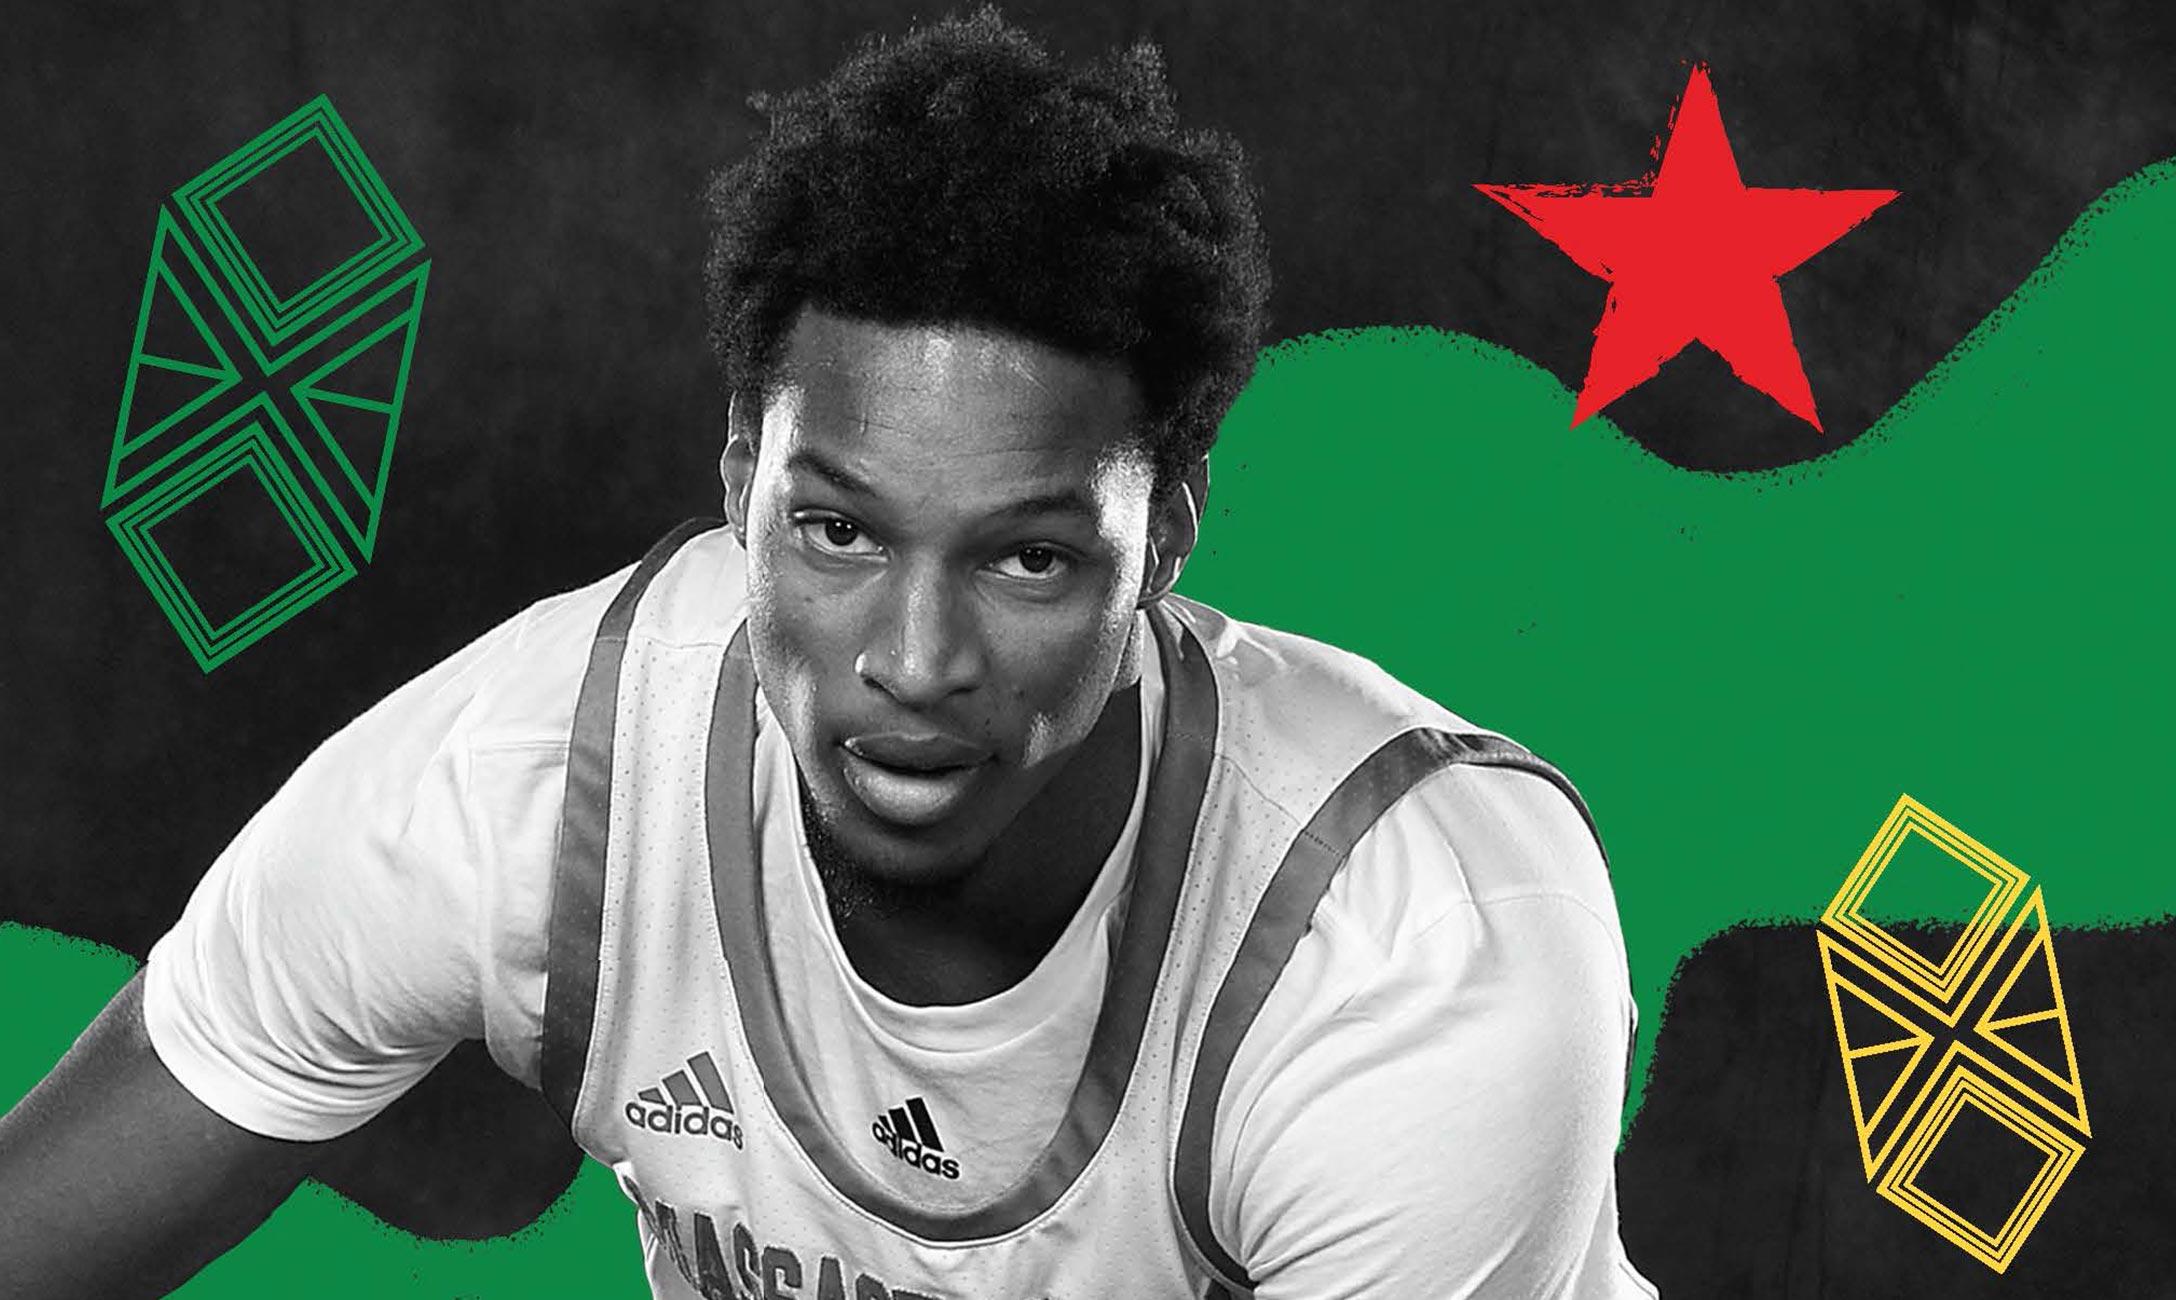 Headshot of basketball player